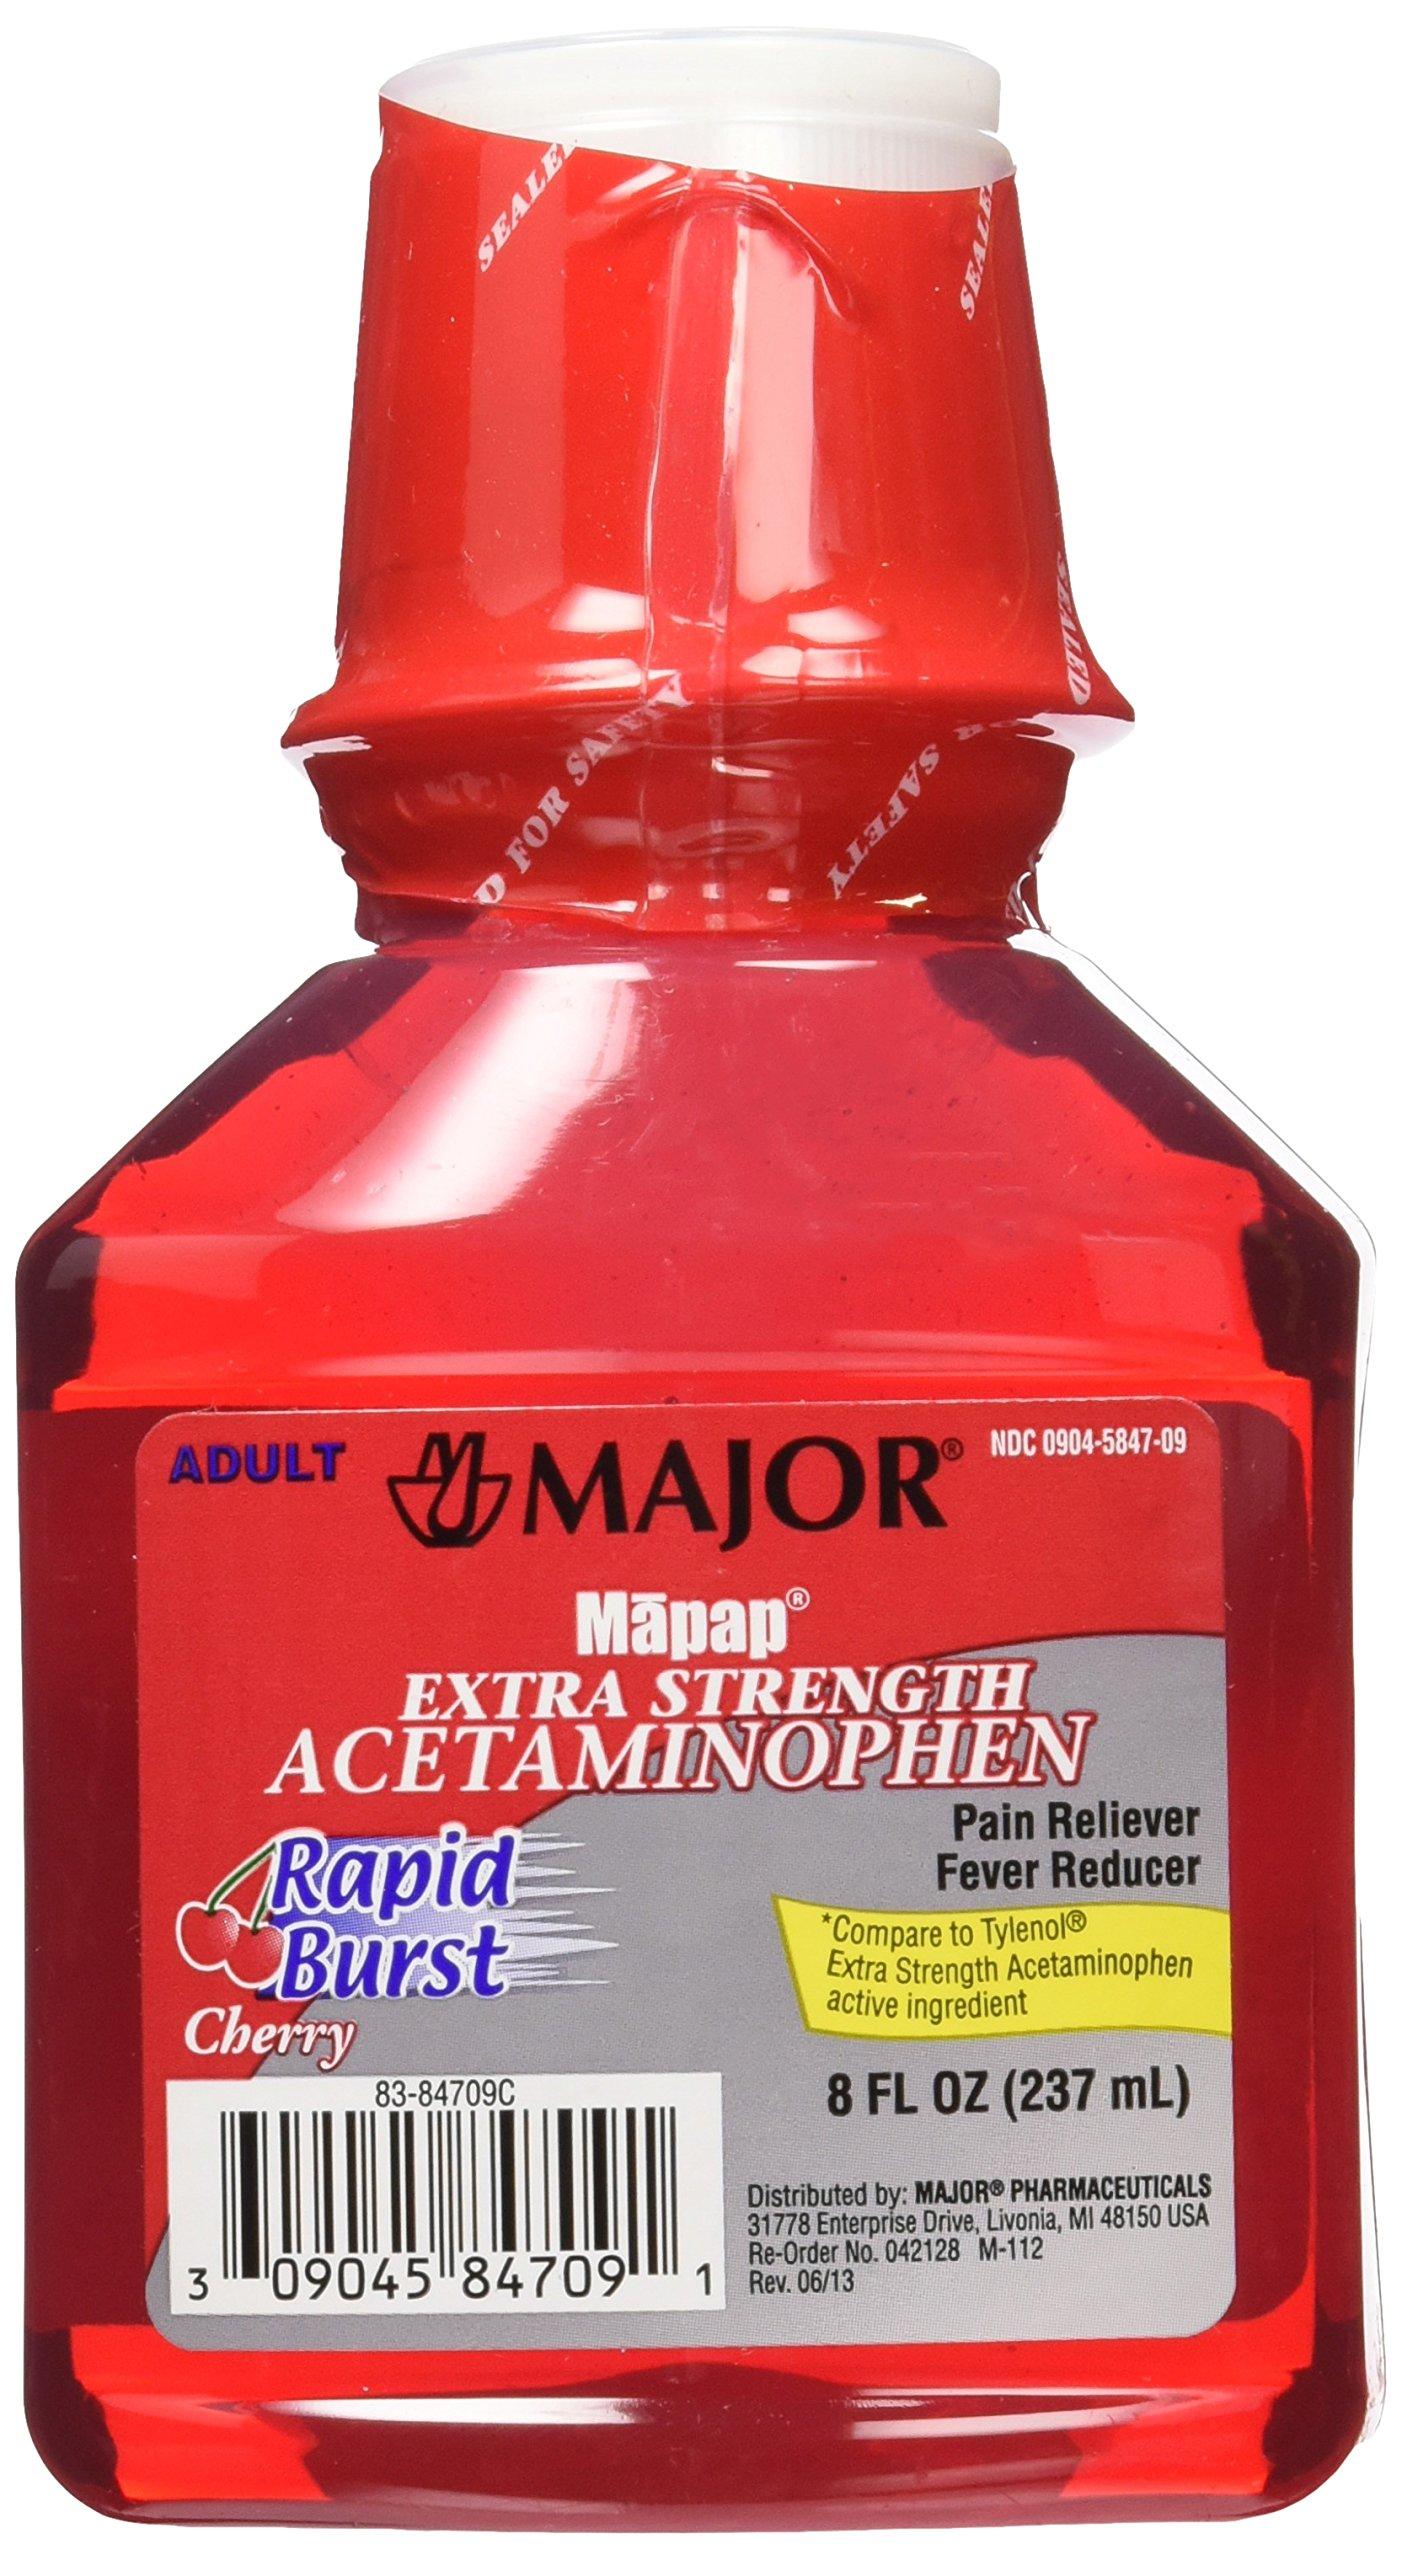 MAJOR Mapap Adult Rapid Extra Strength Acetaminophen Liquid Medication, Burst Cherry, 8 Fl. Oz, 3 Count by MAJOR